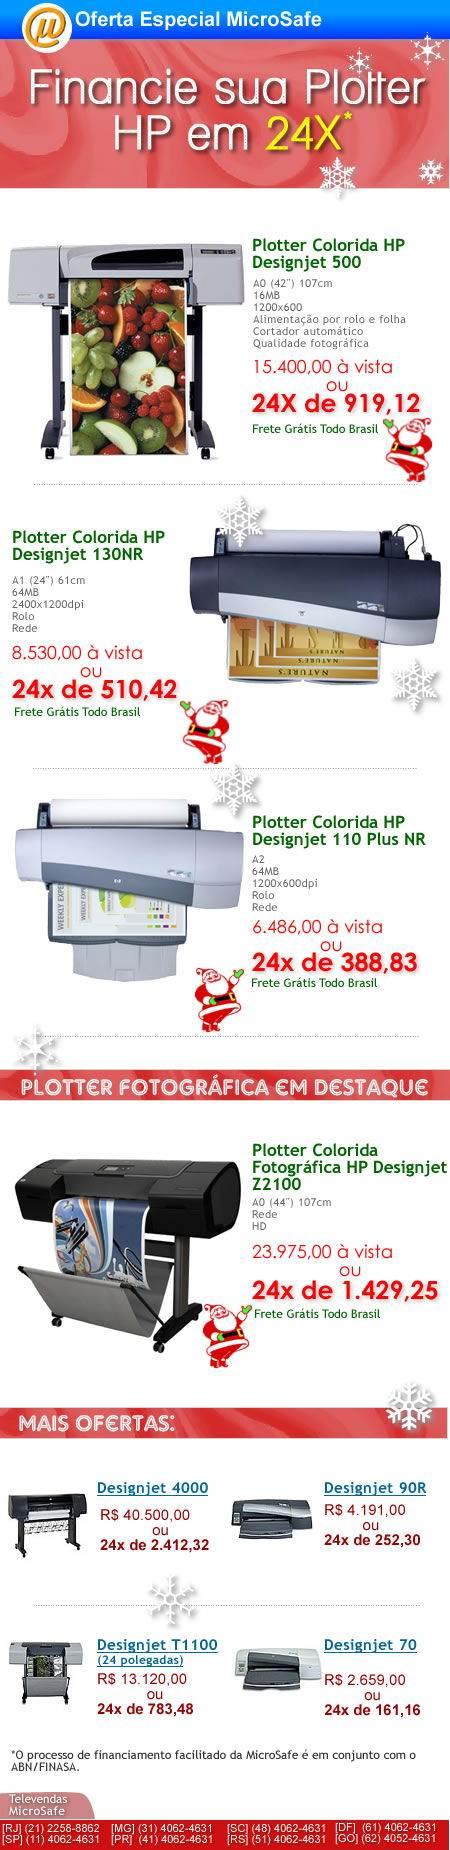 Banner_Plotters_HP_em_24X